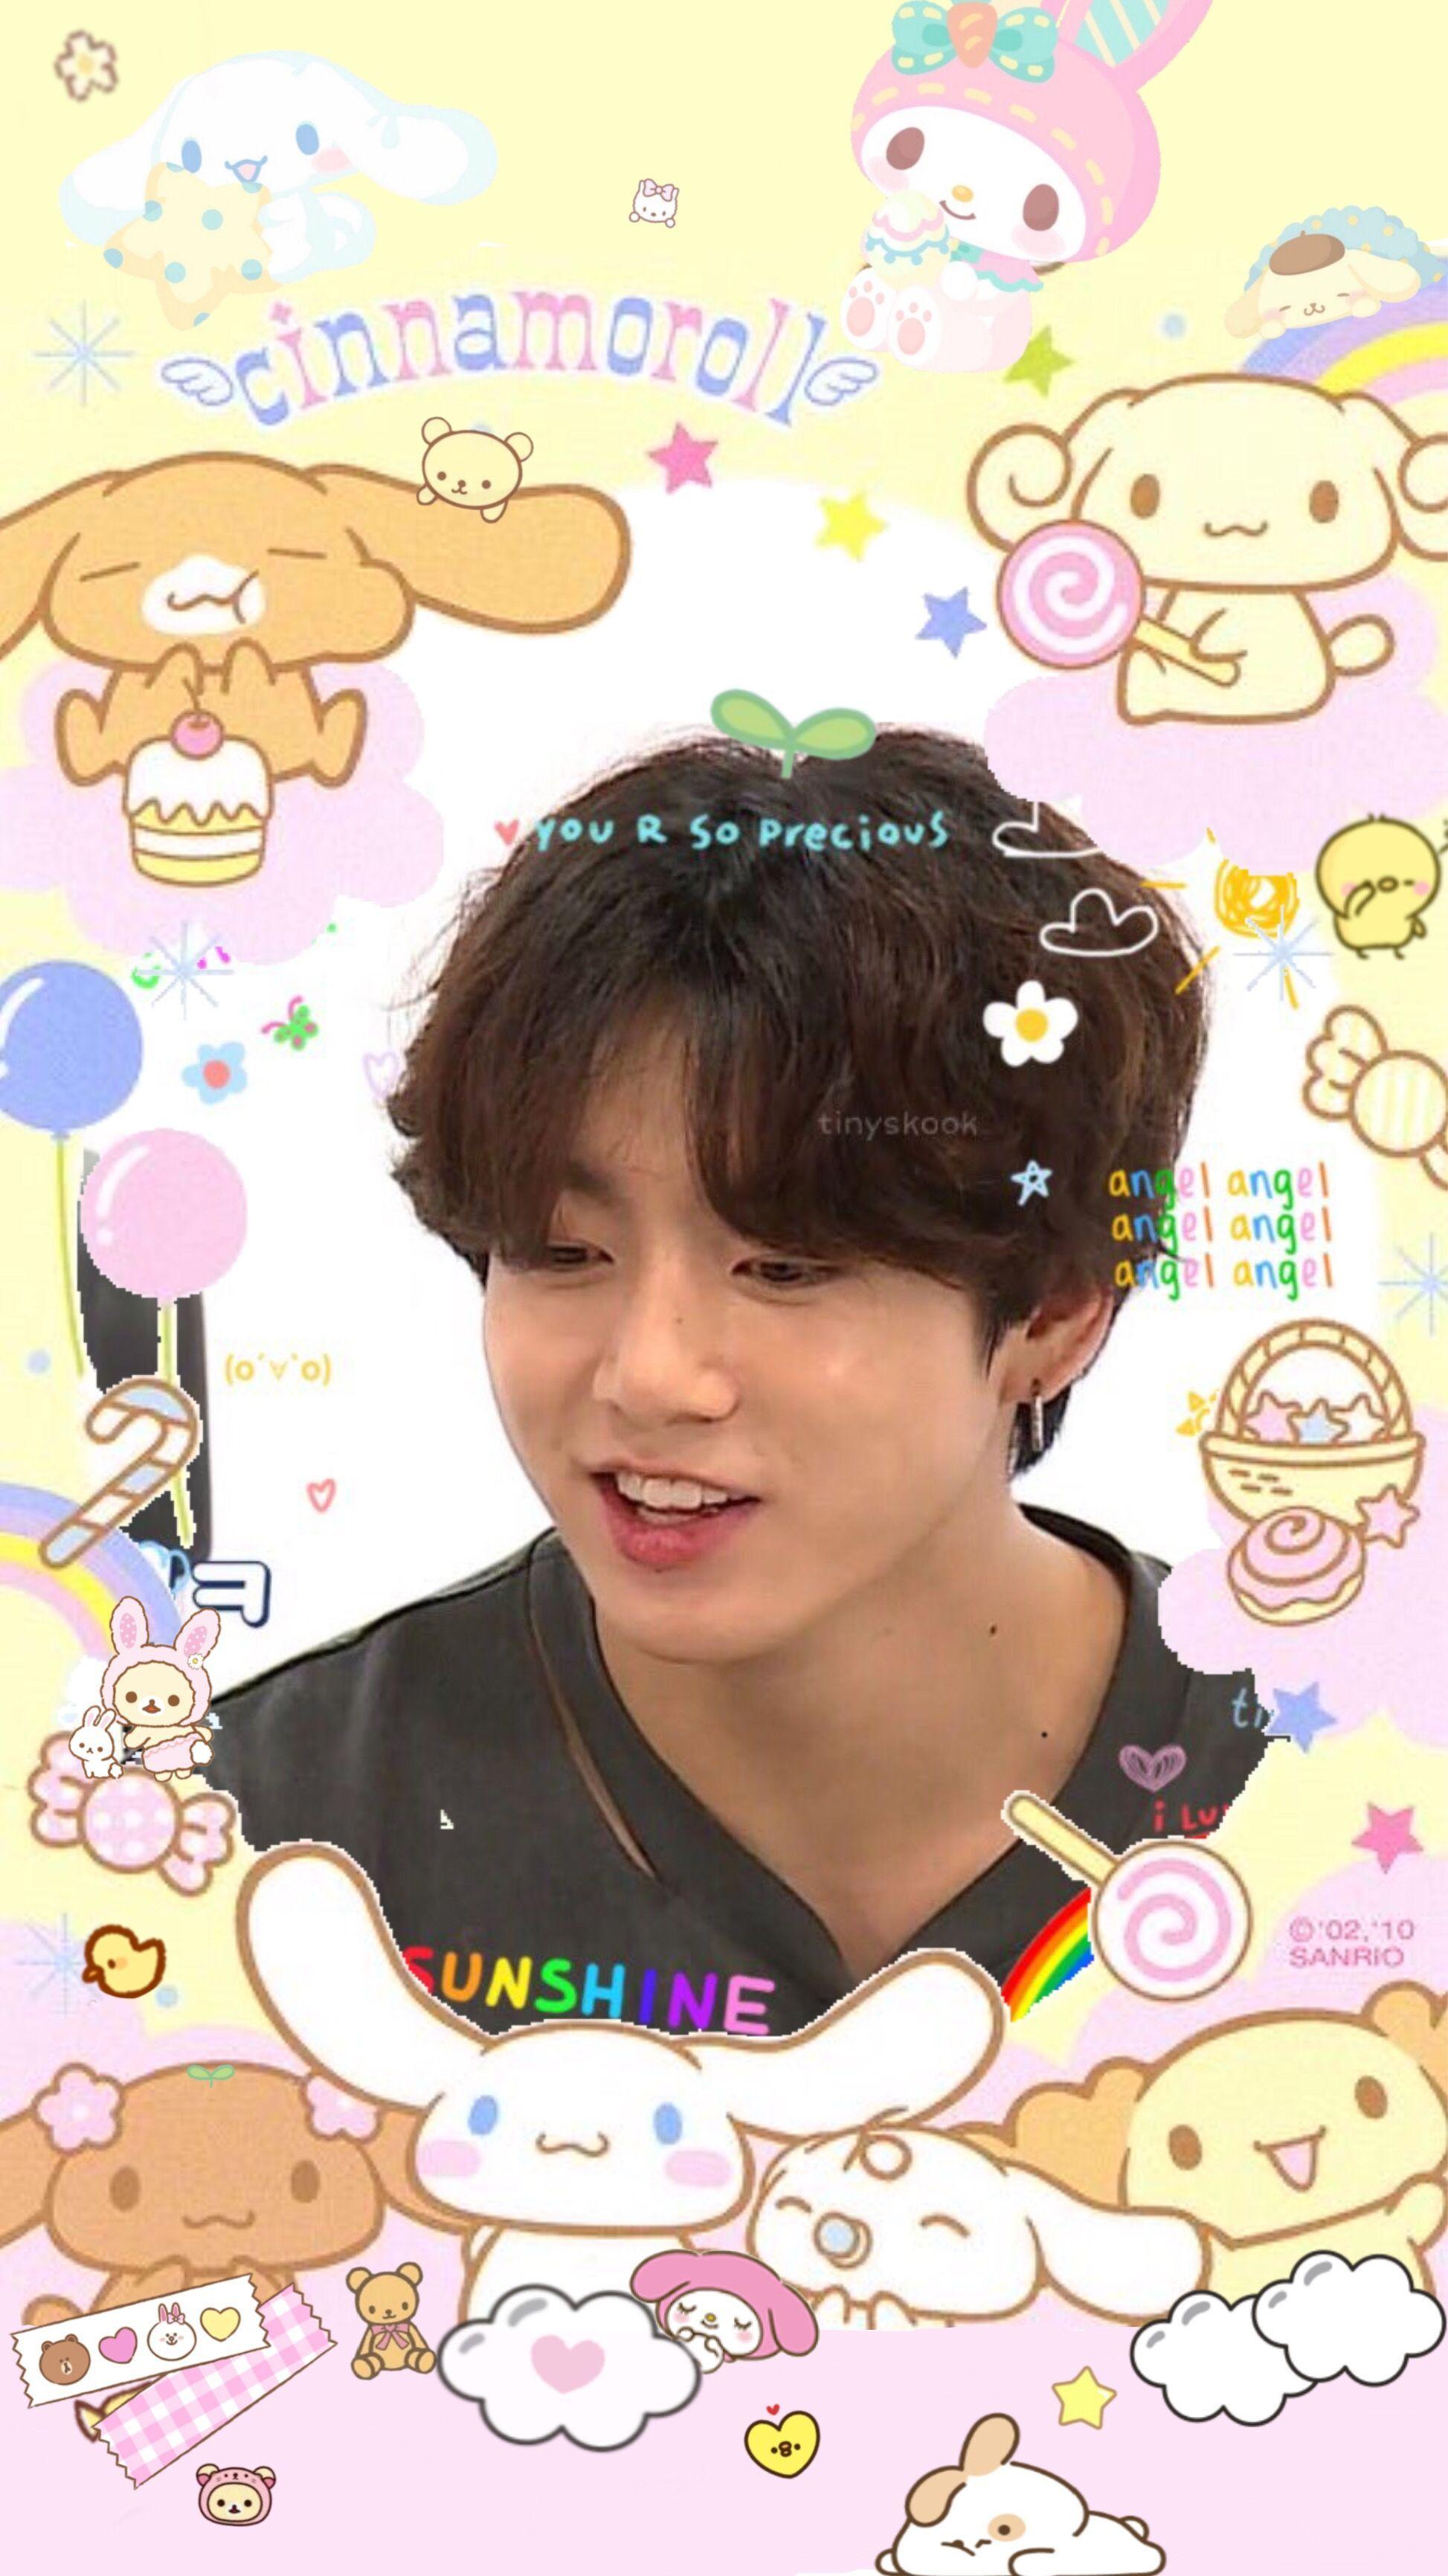 ͘¾ð™ªð™©ð™š Jungkook Cute Cute Wallpapers Bts Jungkook